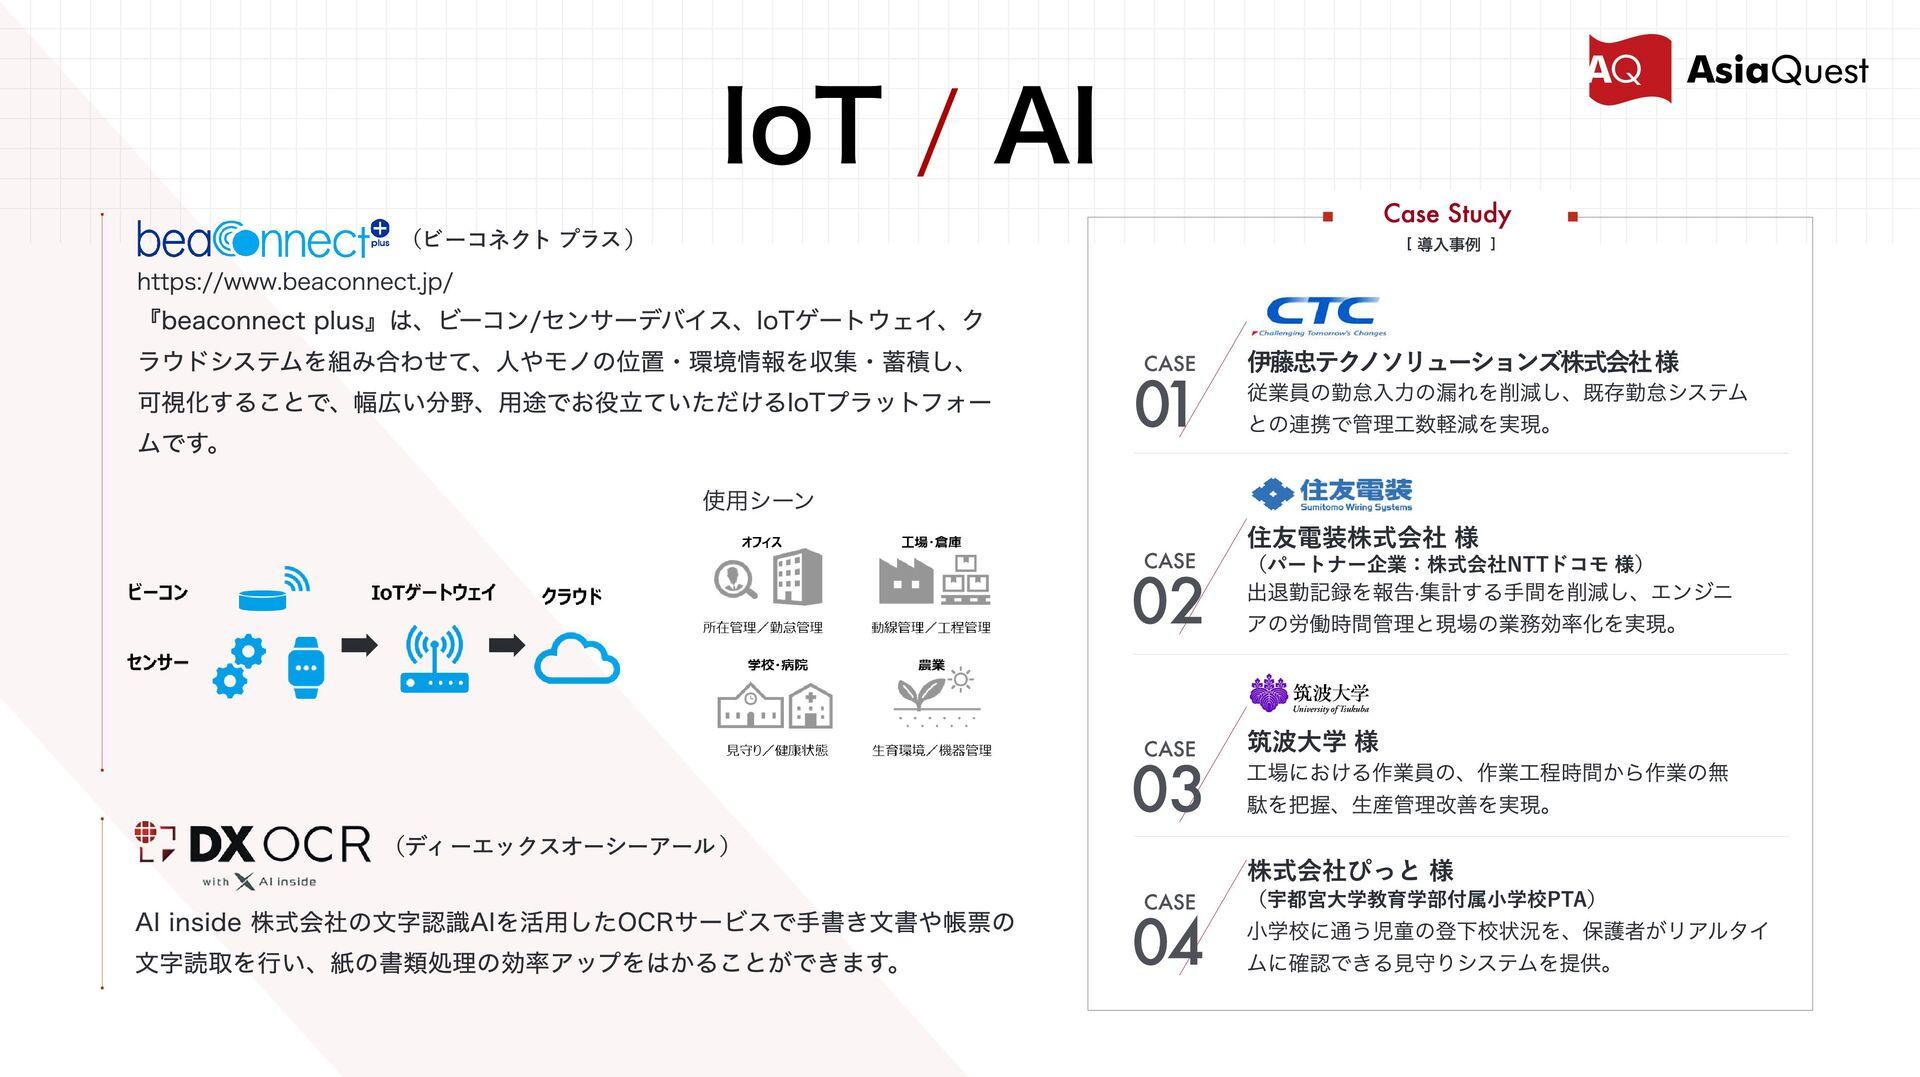 IoT / AI (ディーエックスオーシーアール) AI inside 株式会社の⽂字認識AI...